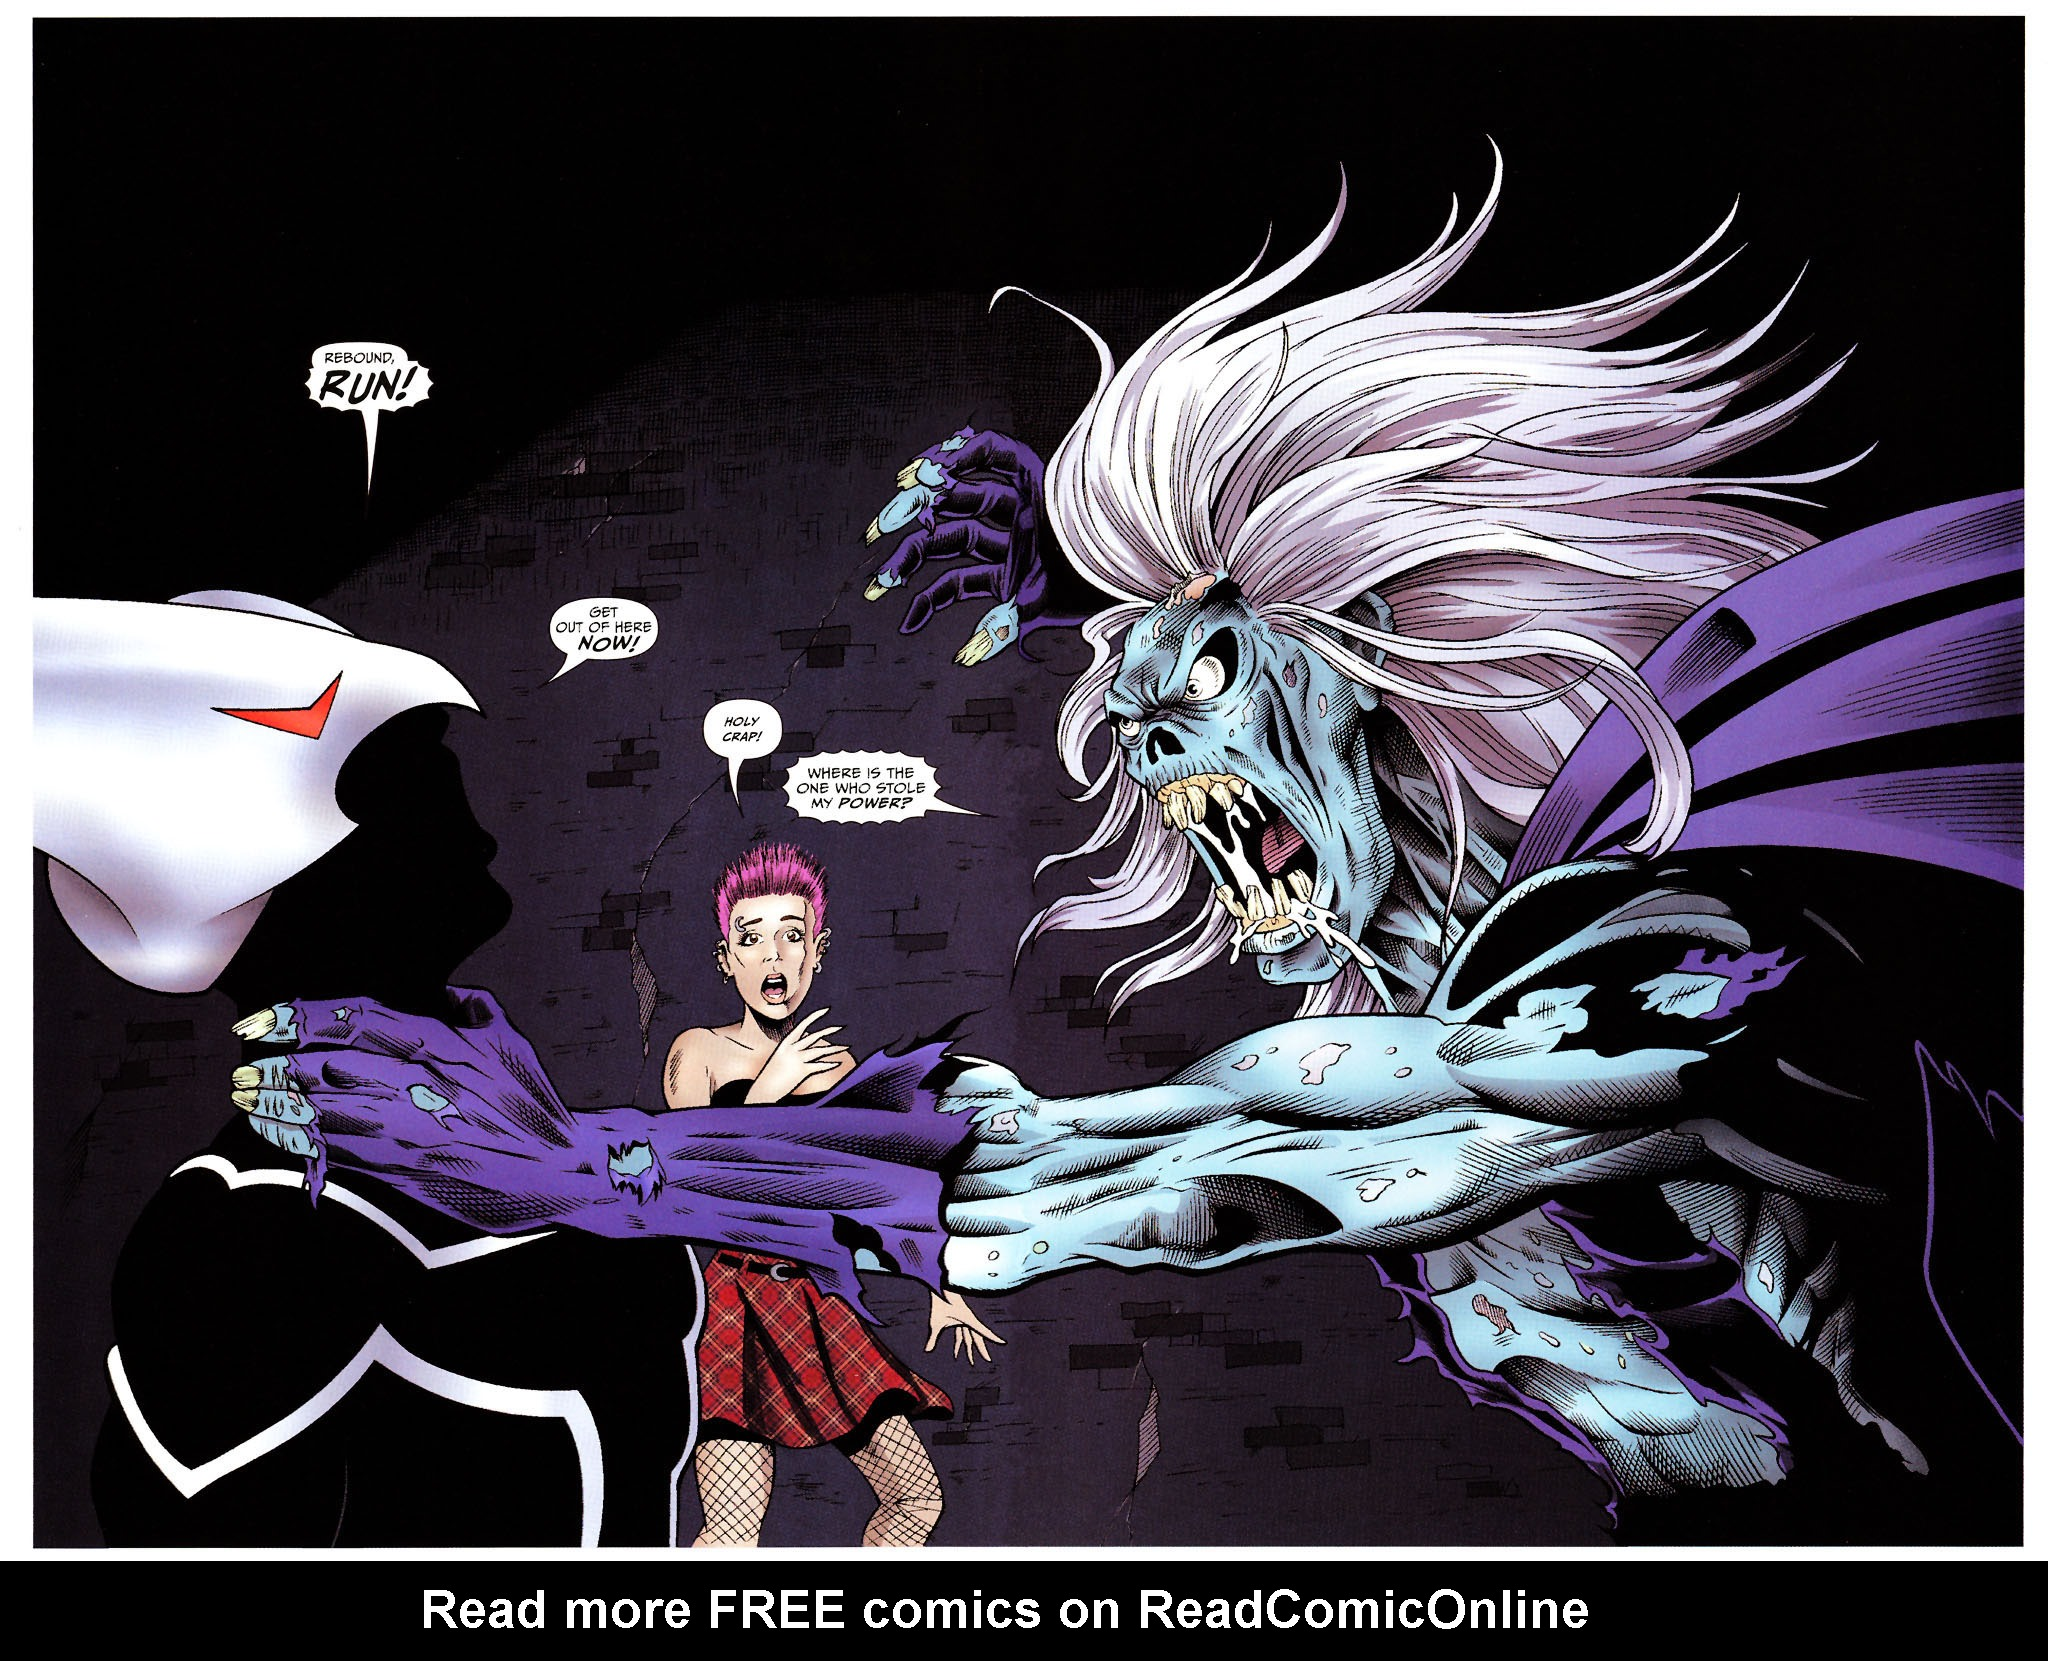 Read online ShadowHawk (2005) comic -  Issue #15 - 4